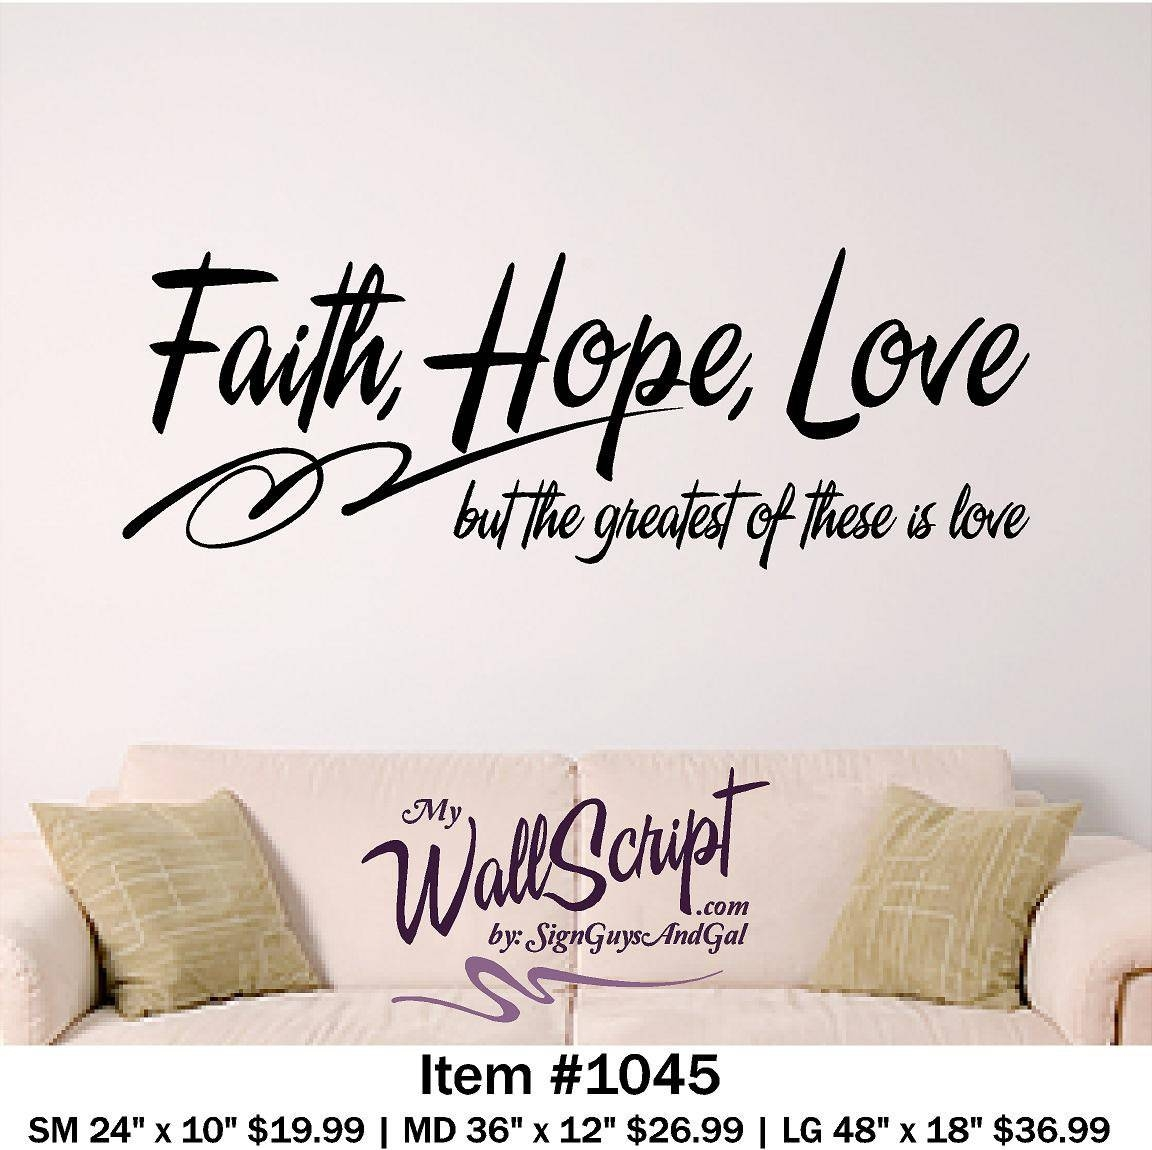 Bible Verse Wall Art Faith Hope Love Wall Decal Regarding Best And Newest Bible Verses Wall Art (Gallery 2 of 30)